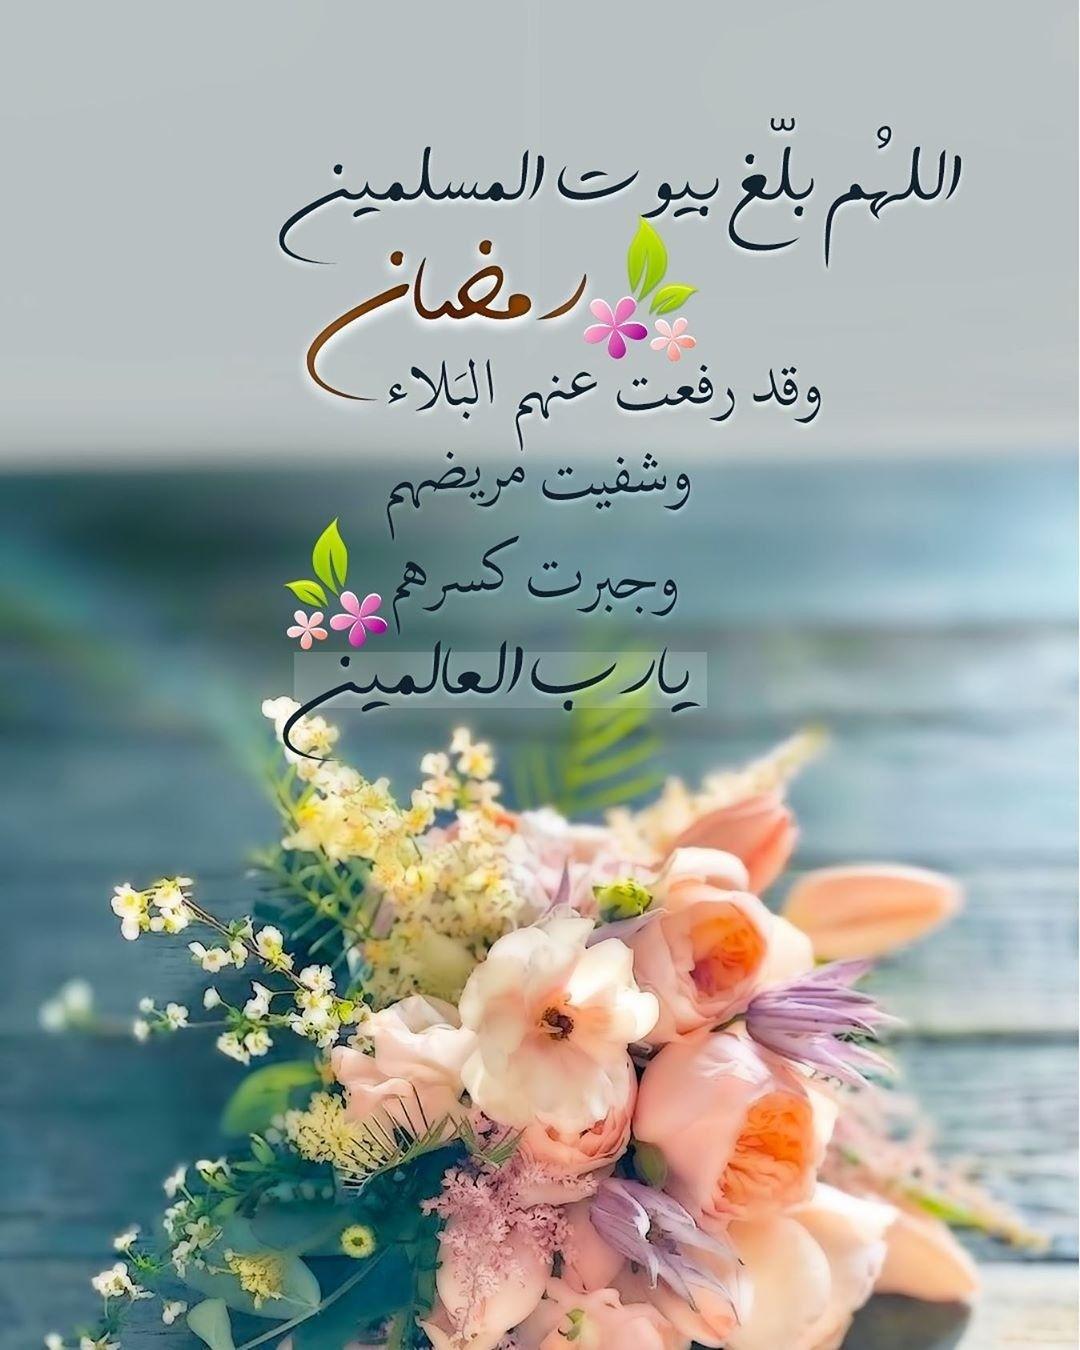 Pin By وة On رمضان In 2020 Ramadan Wishes Ramadan Greetings Happy Ramadan Mubarak